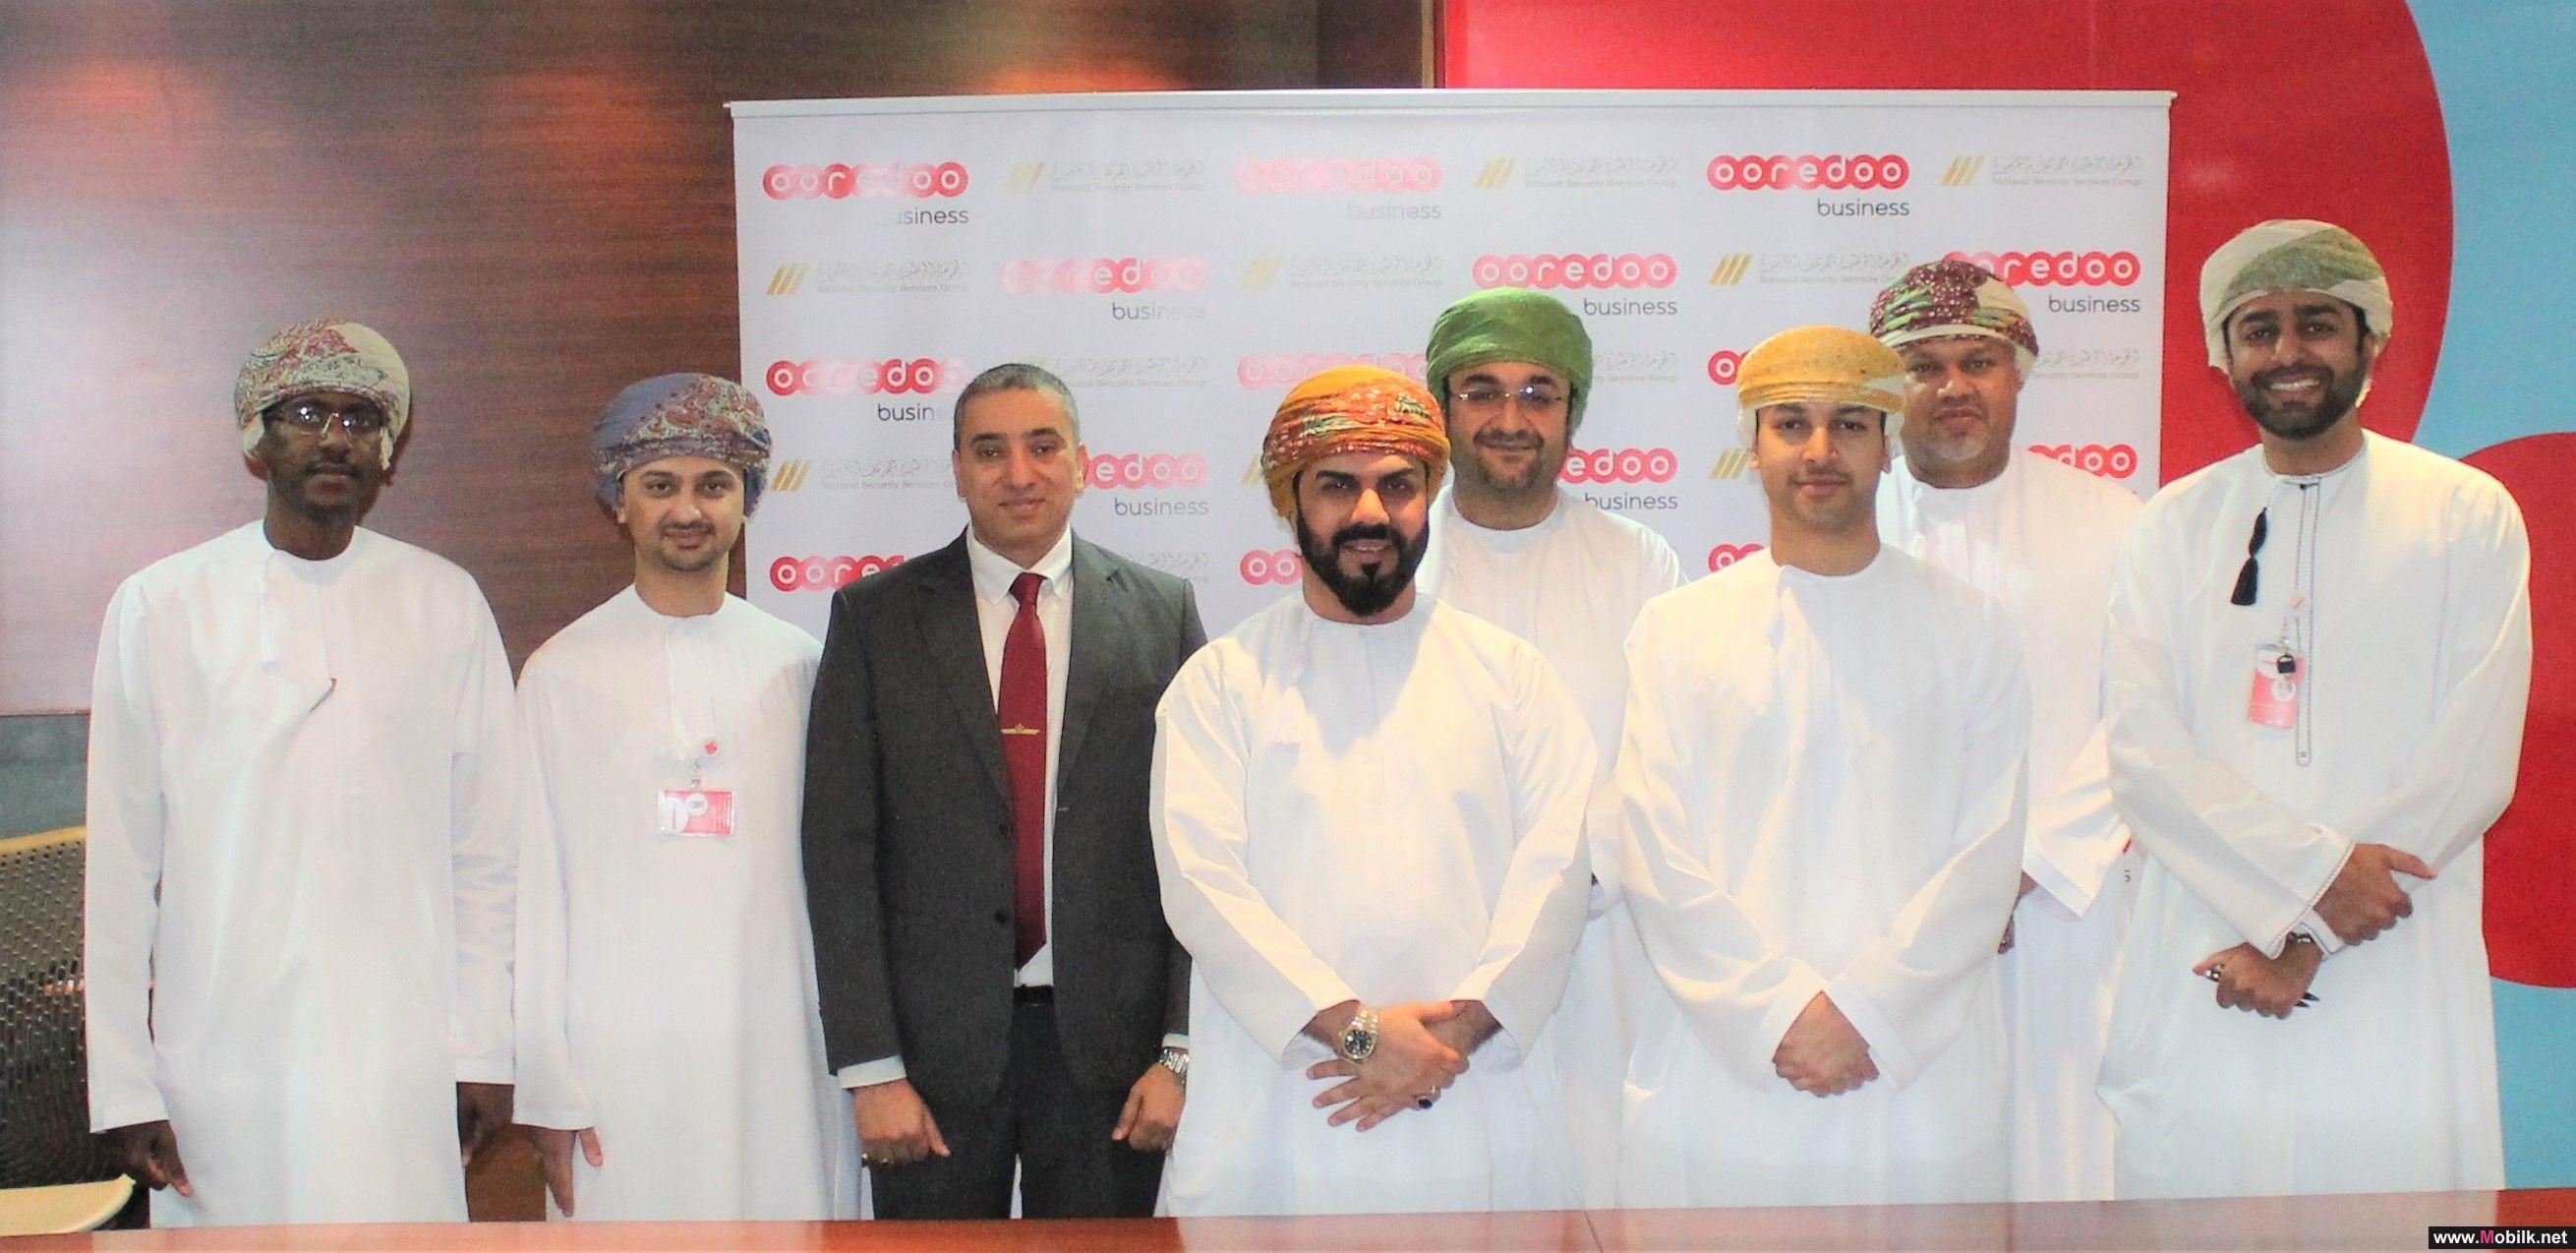 Ooredoo تتعاون مع المجموعة الوطنية للخدمات الأمنية من أجل تعزيز الأمان الرقمي بالسلطنة